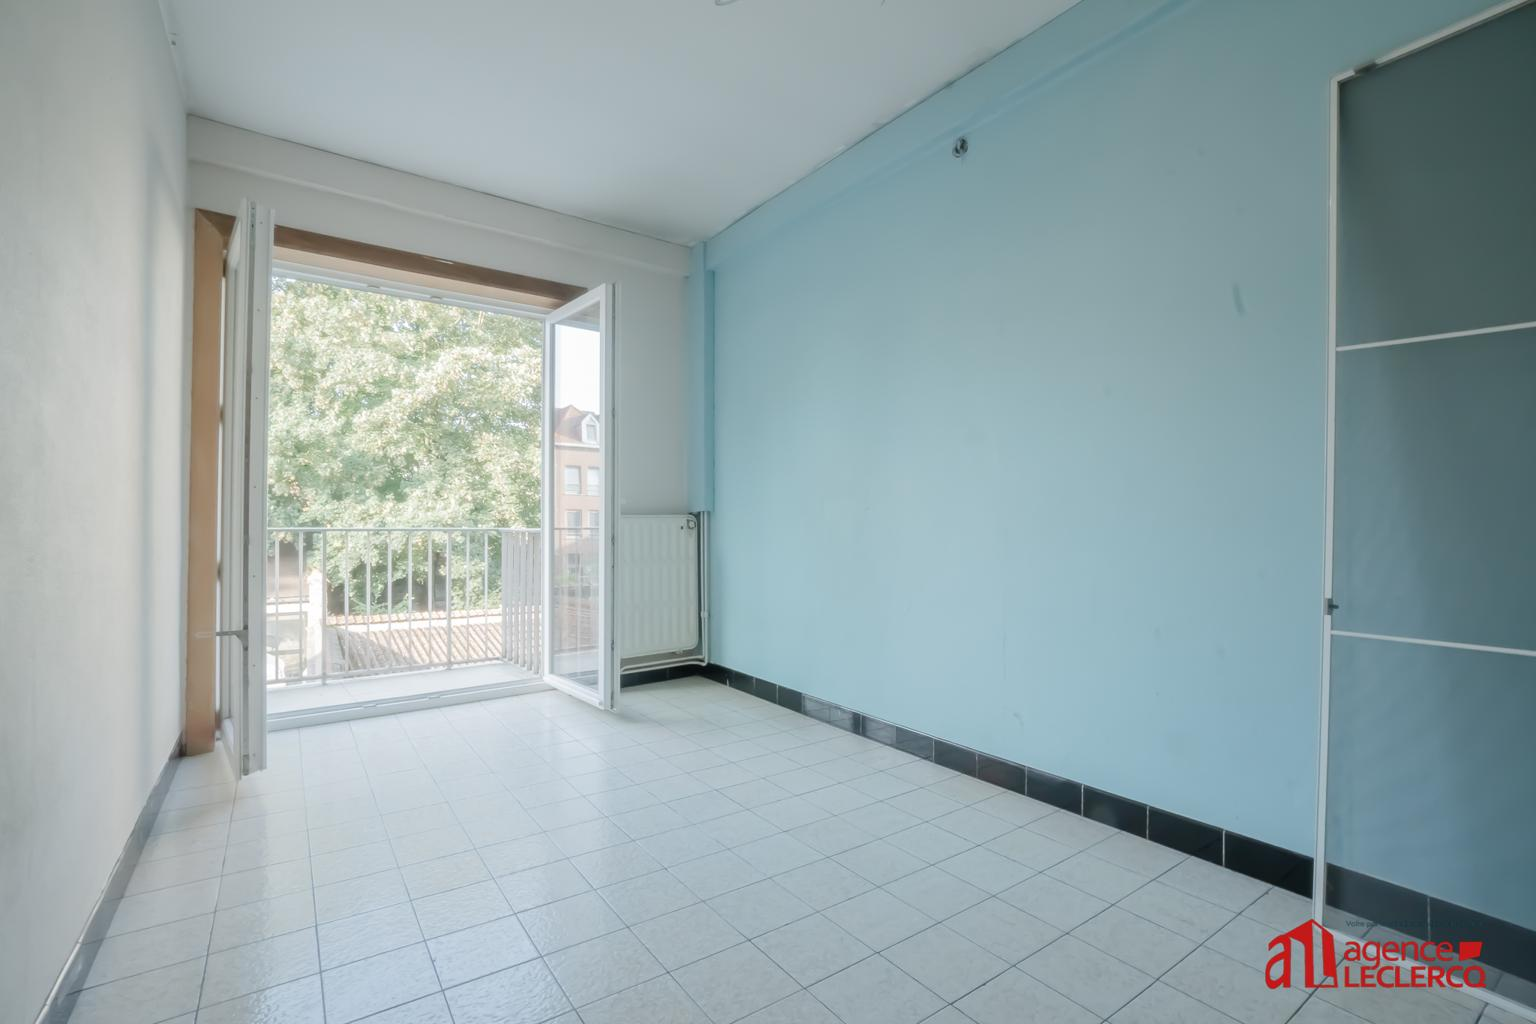 Appartement - Tournai - #4521519-15